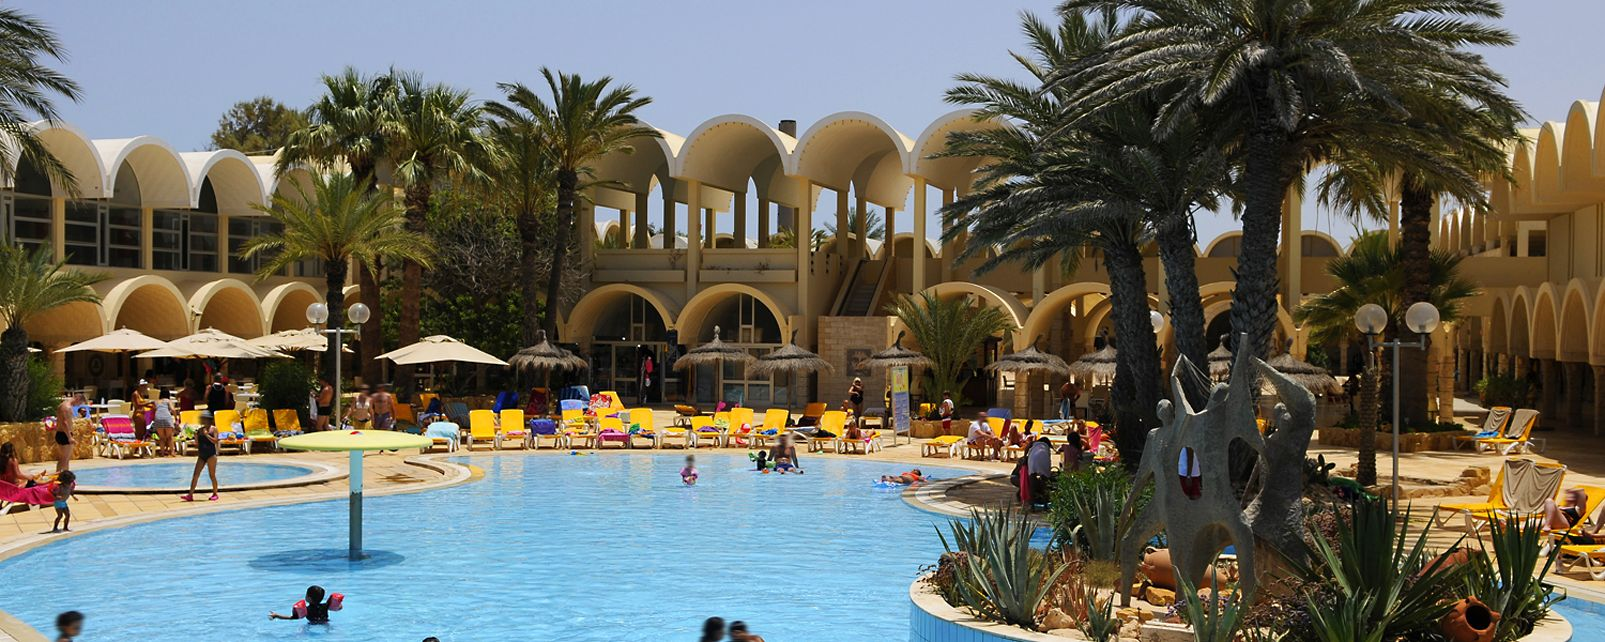 Hôtel Dahlia - Dar Djerba